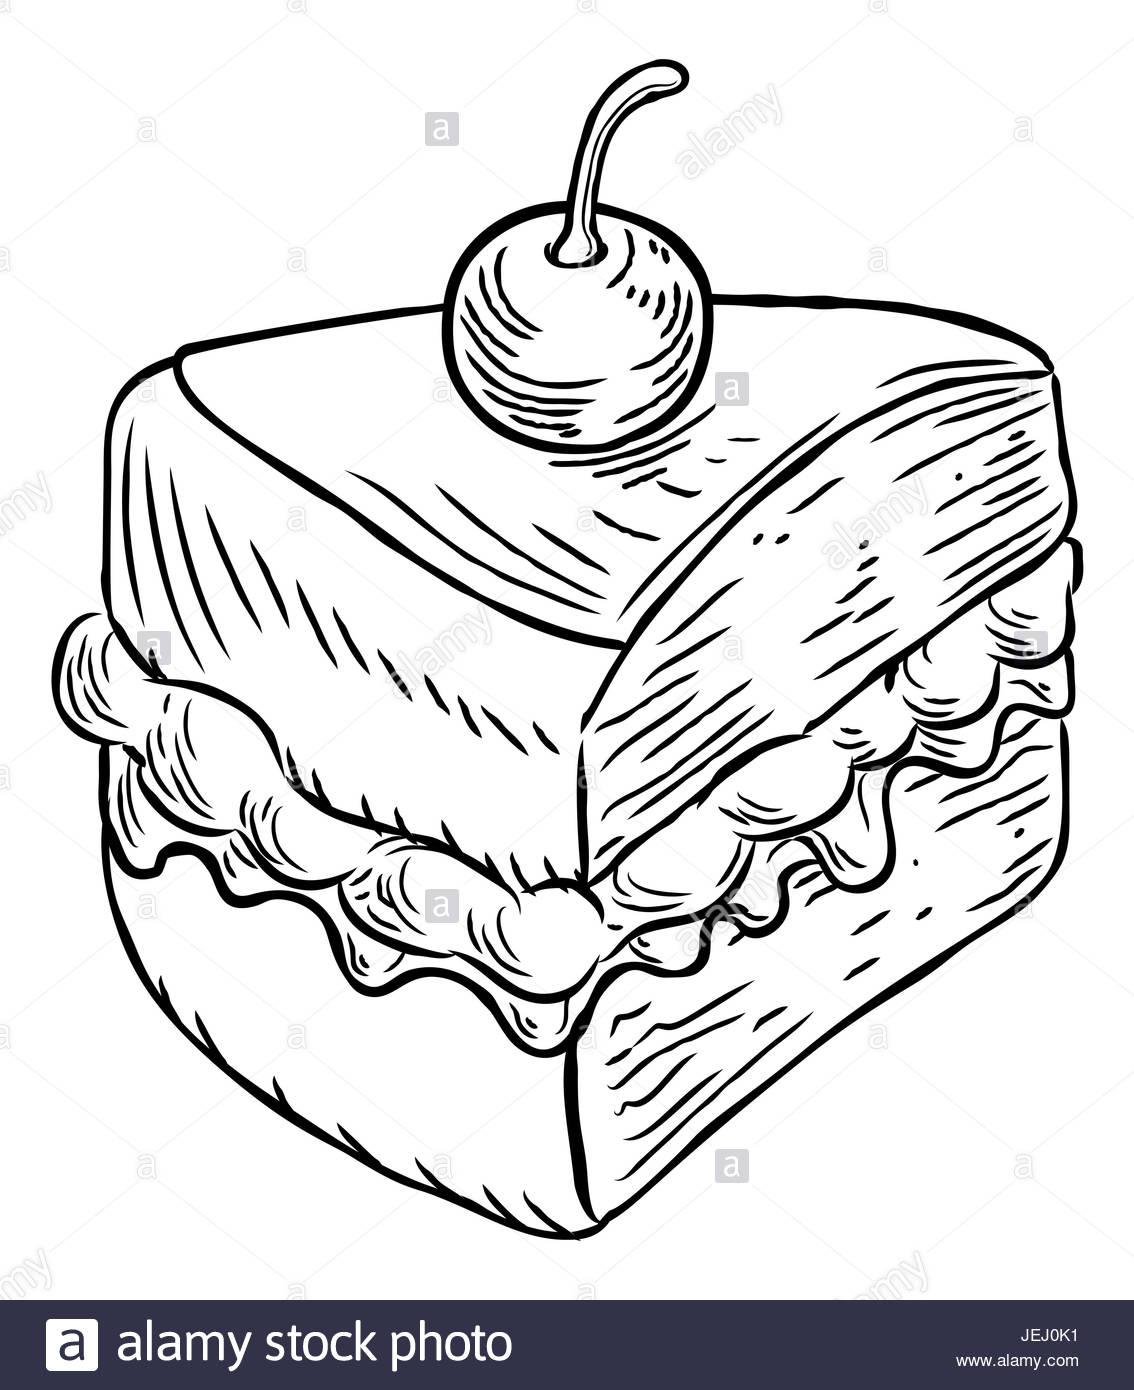 1134x1390 A Jam And Cream Victoria Sponge Cake Slice With Cherry, Hand Draw